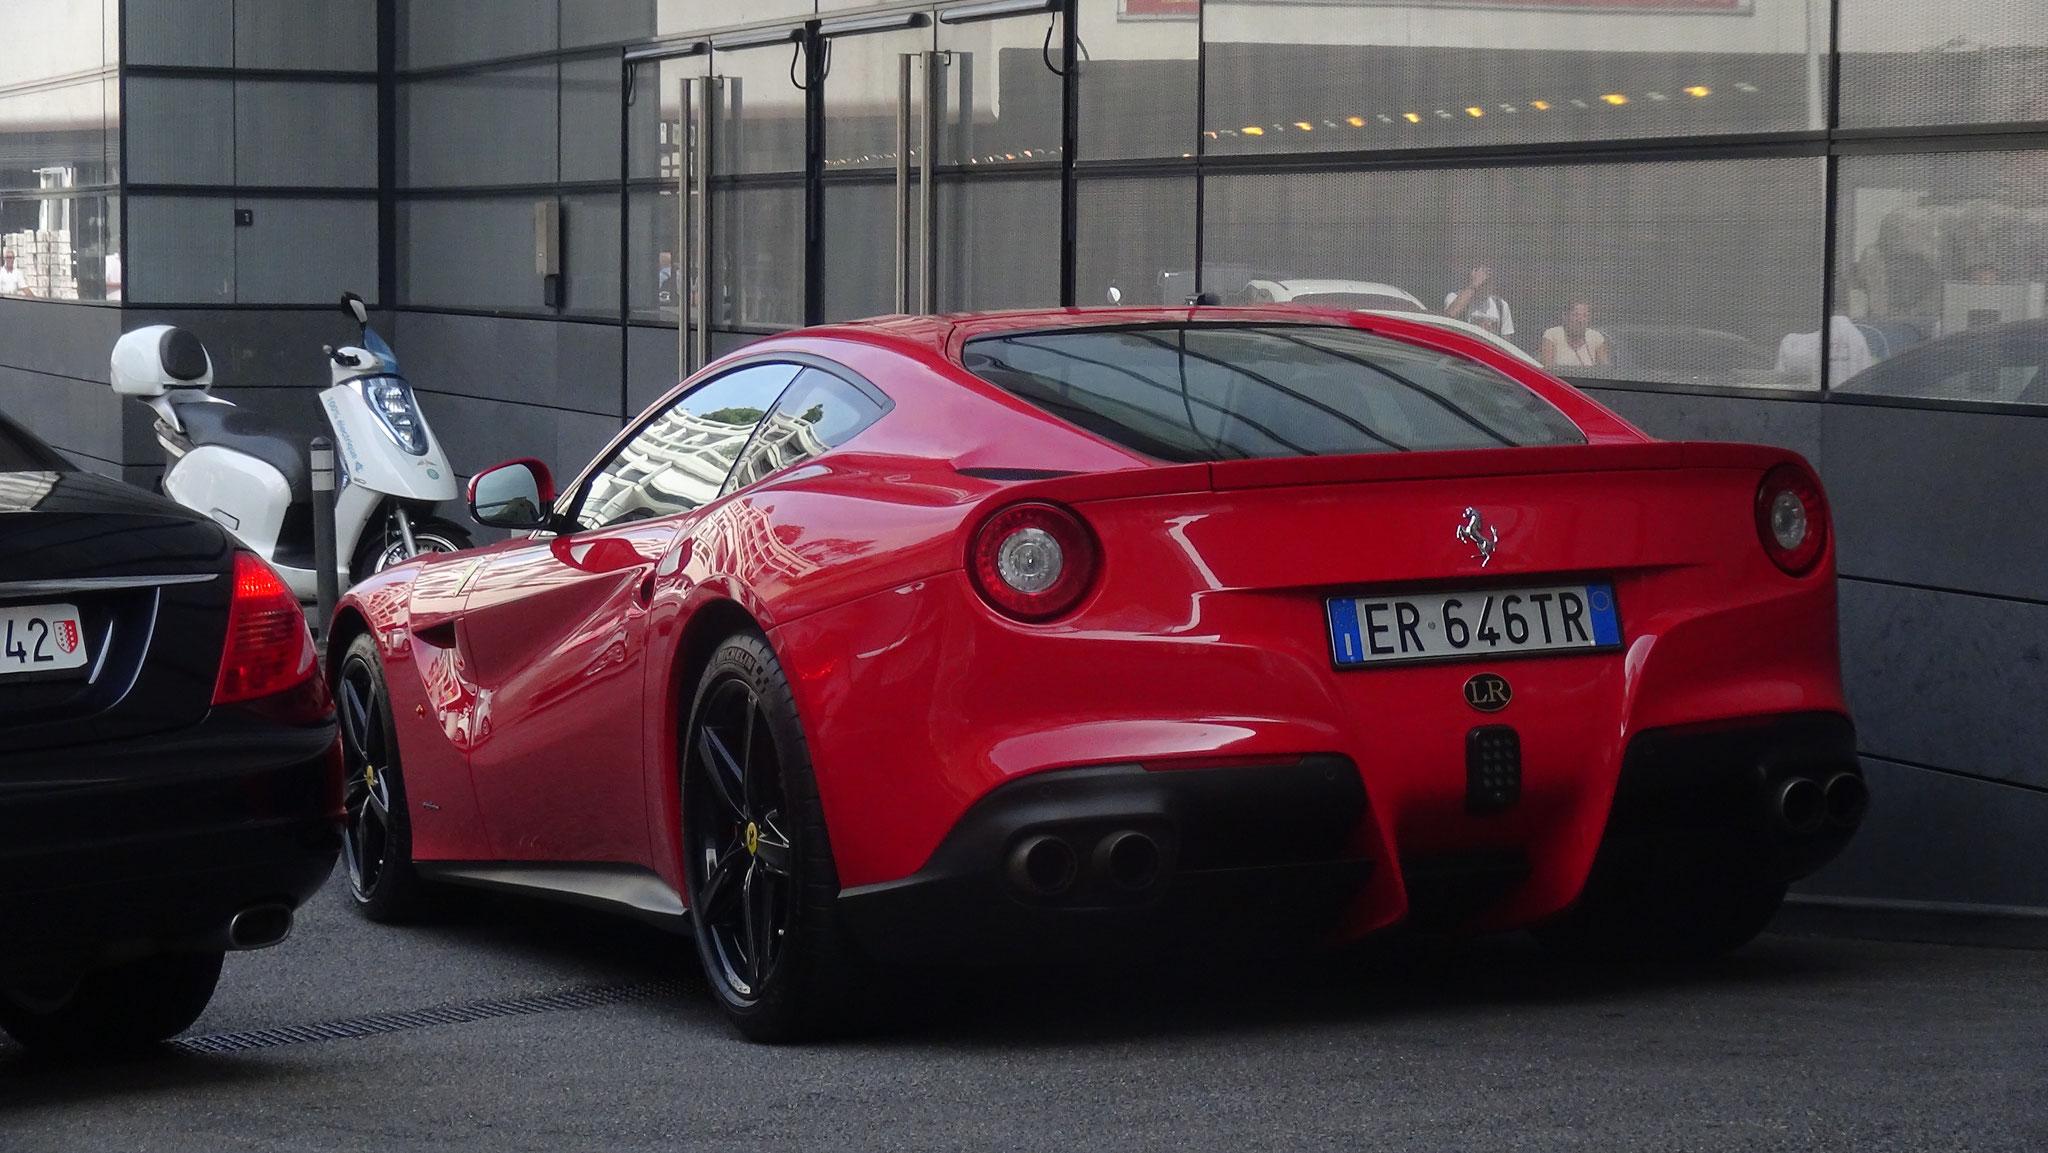 Ferrari F12 Berlinetta - ER-646-TR (ITA)